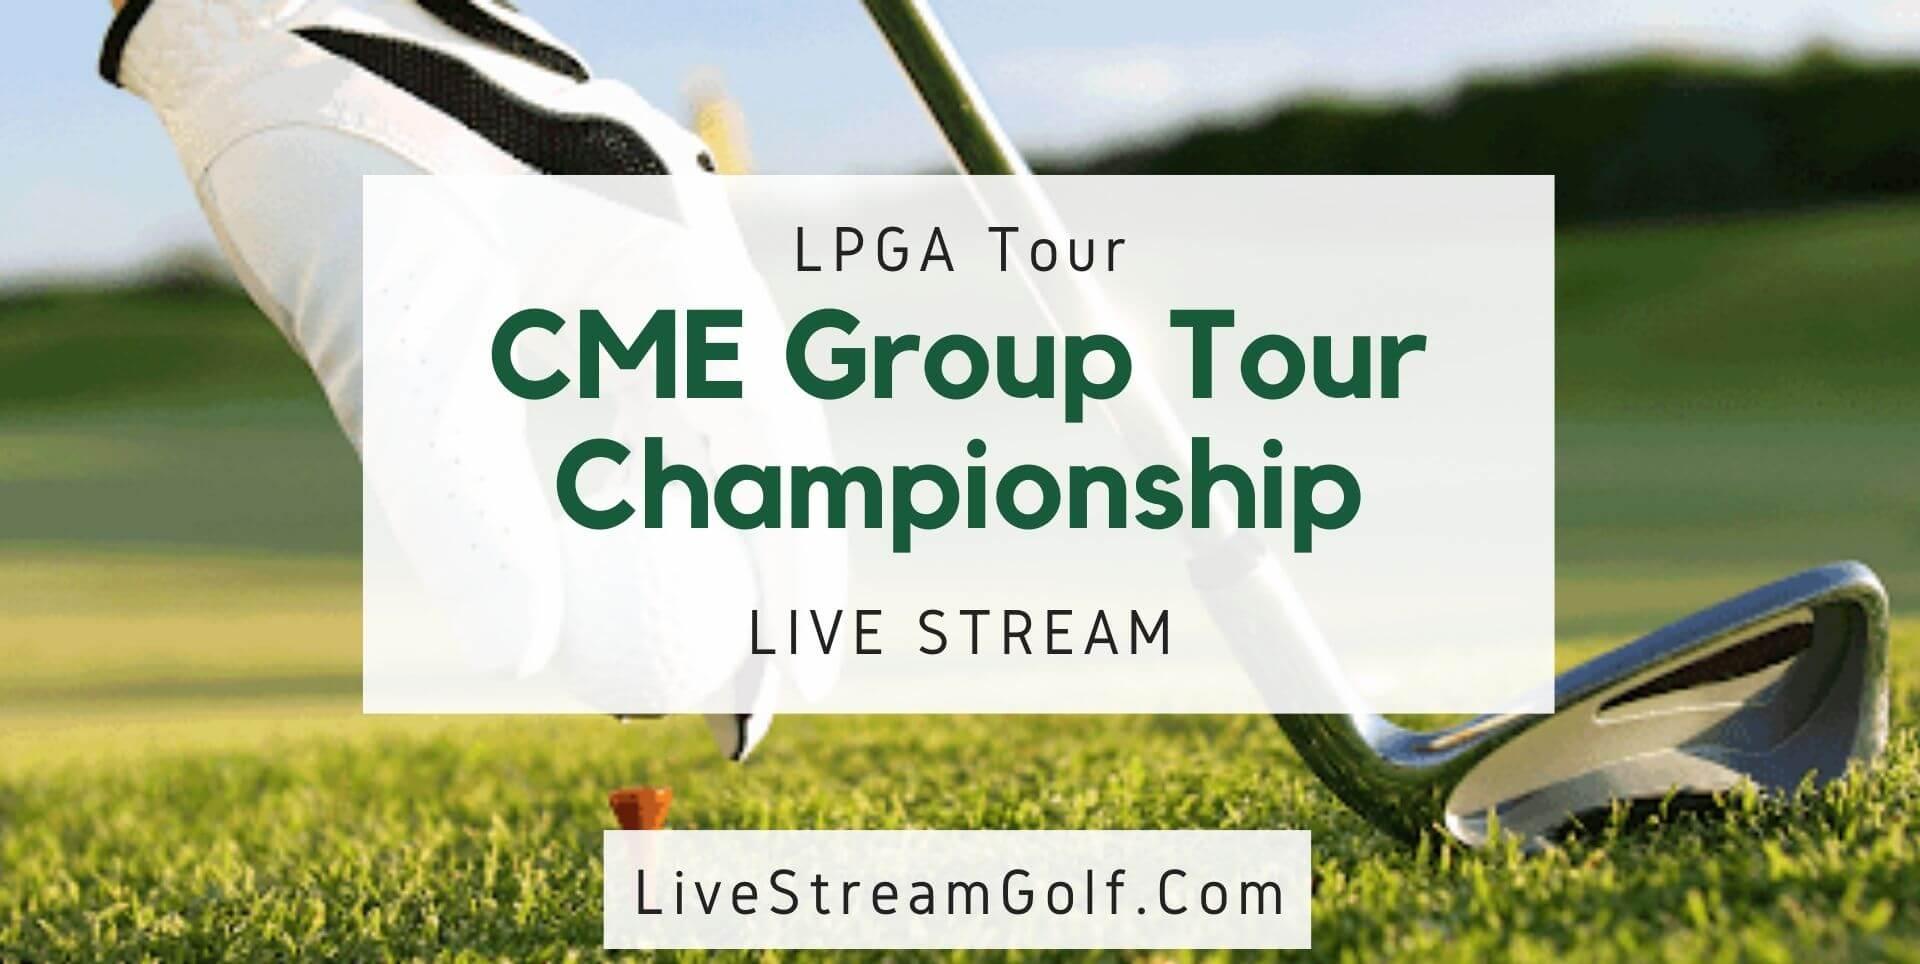 CME Group Tour Championship Rd 1 Live Stream: LPGA Tour 2021